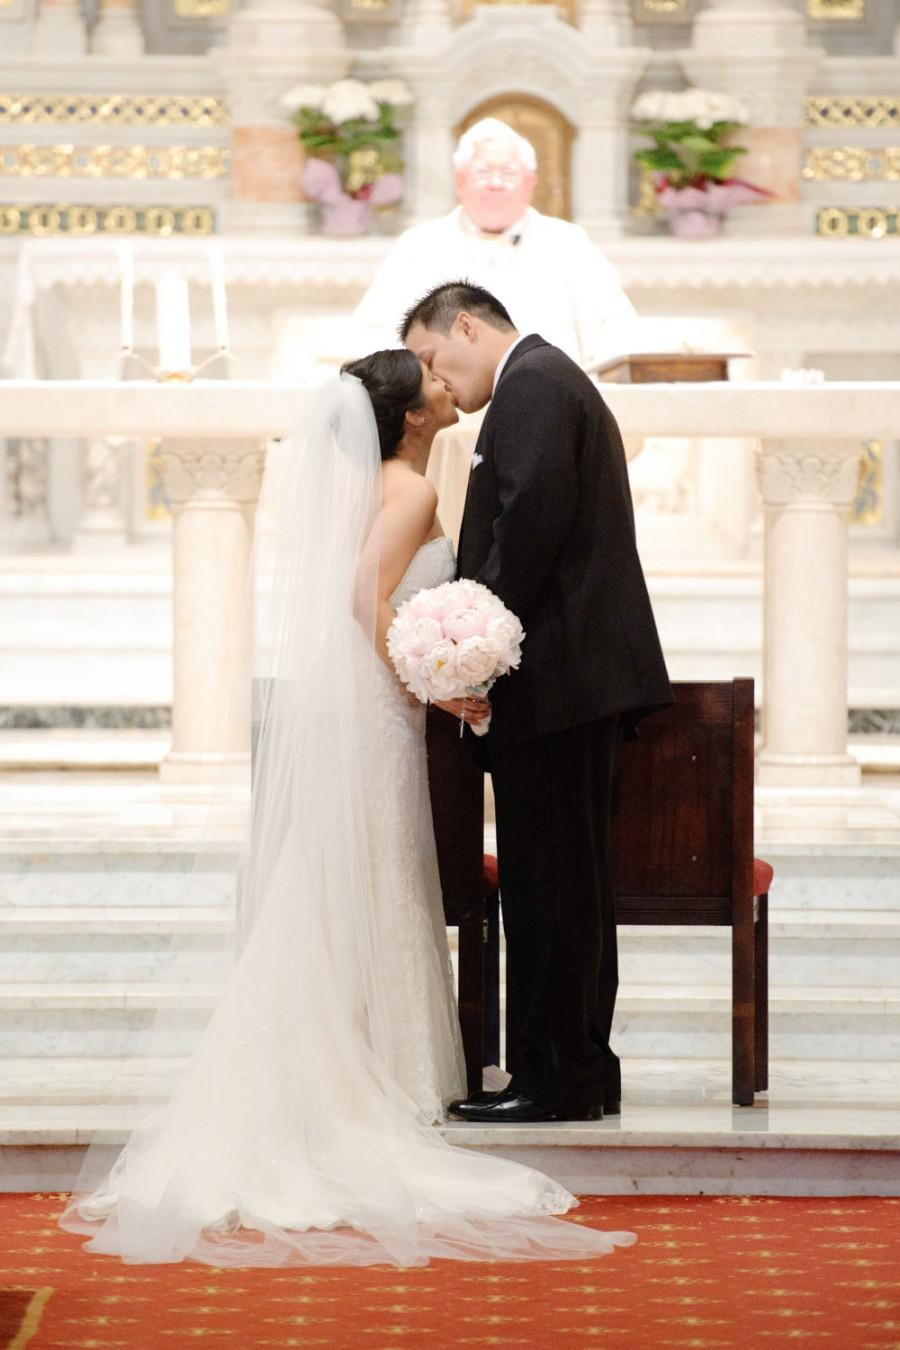 Hochzeit - floor length two tier Wedding Bridal Veil  72 inches white, ivory or diamond